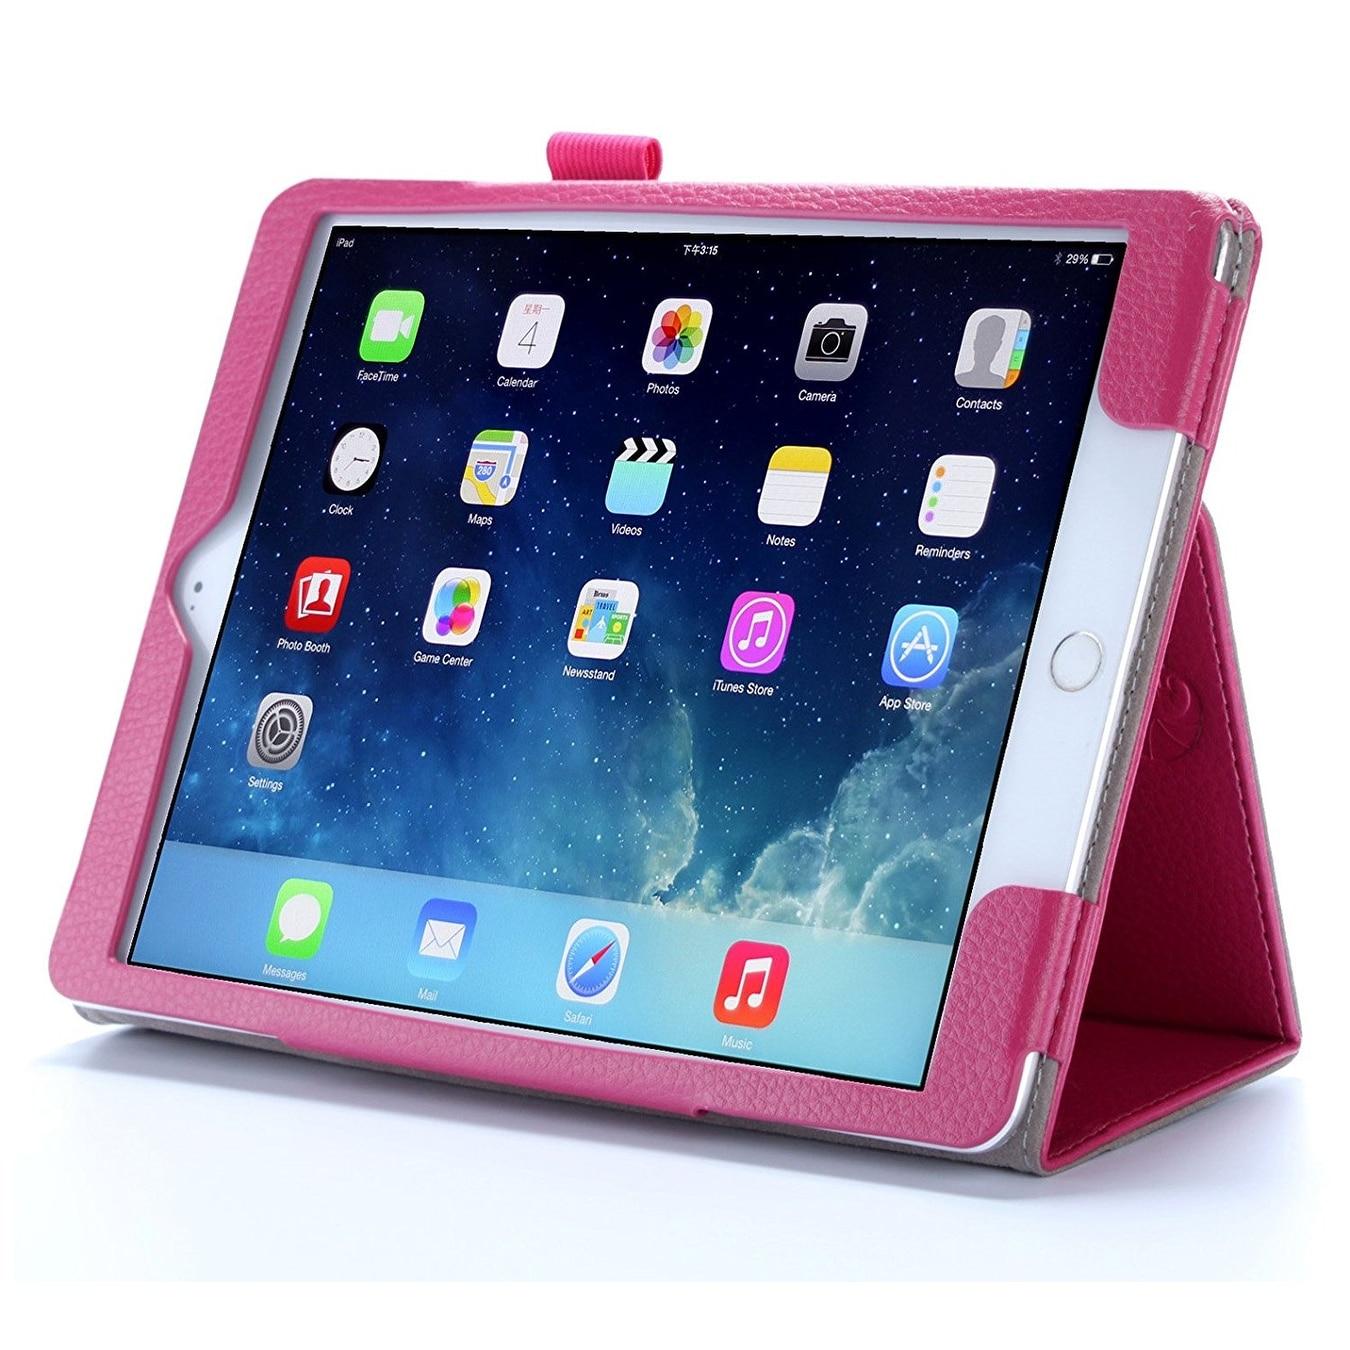 Tampa Bay Lightning Digi Camo Design on Black iPad Air 2 Swivel Stand Case